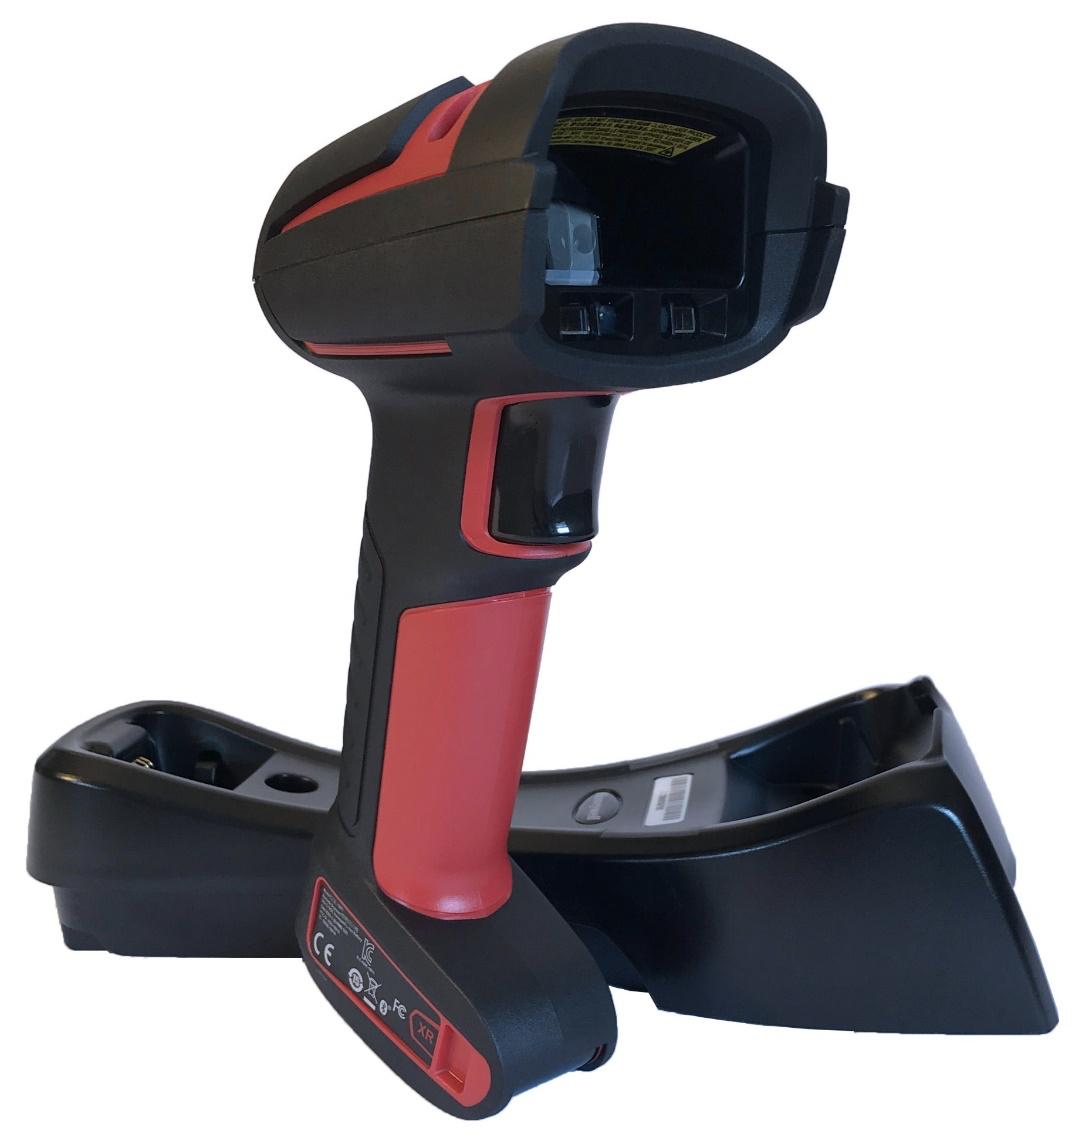 Honeywell Granit™ Scanner